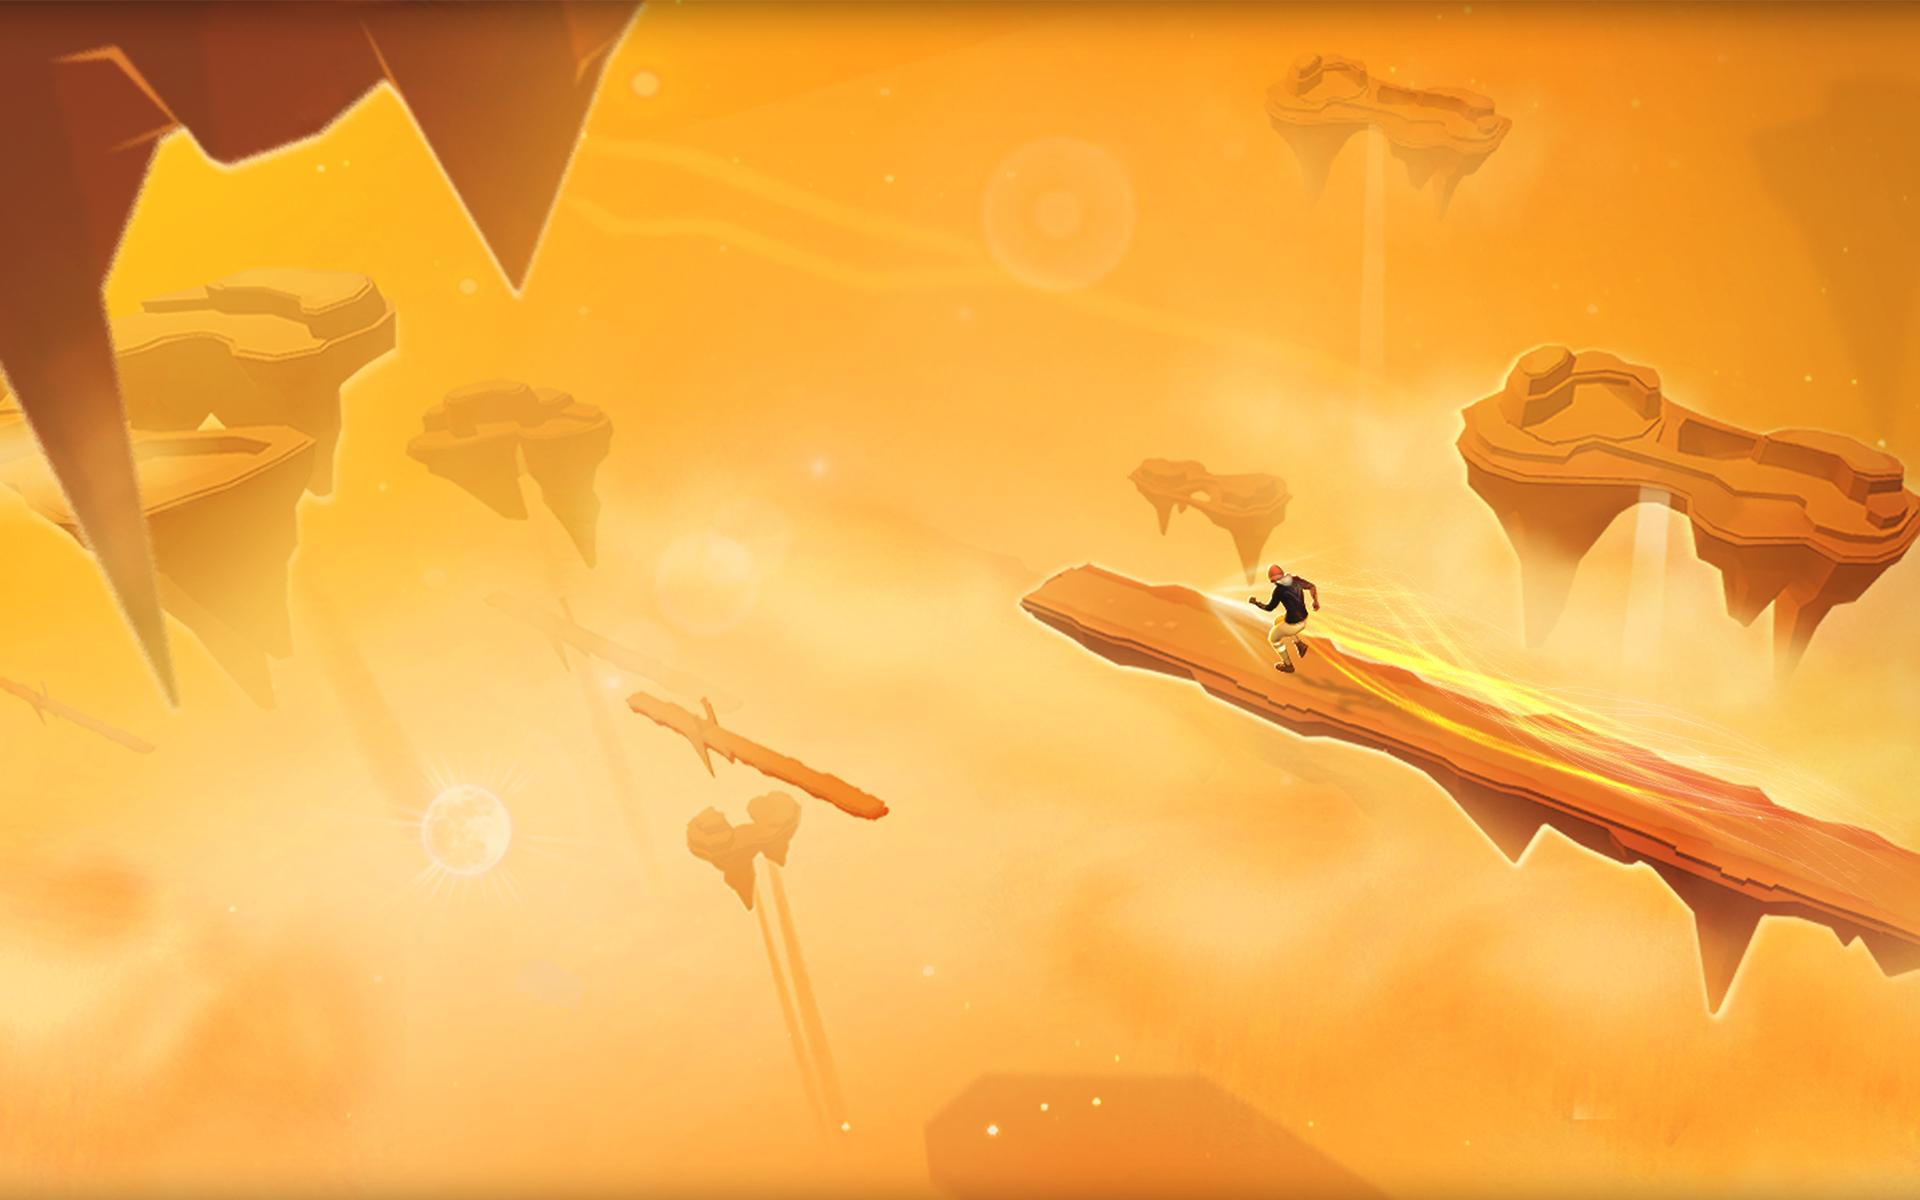 Sky Dancer Run - Running Game 4.2.0 Screenshot 20